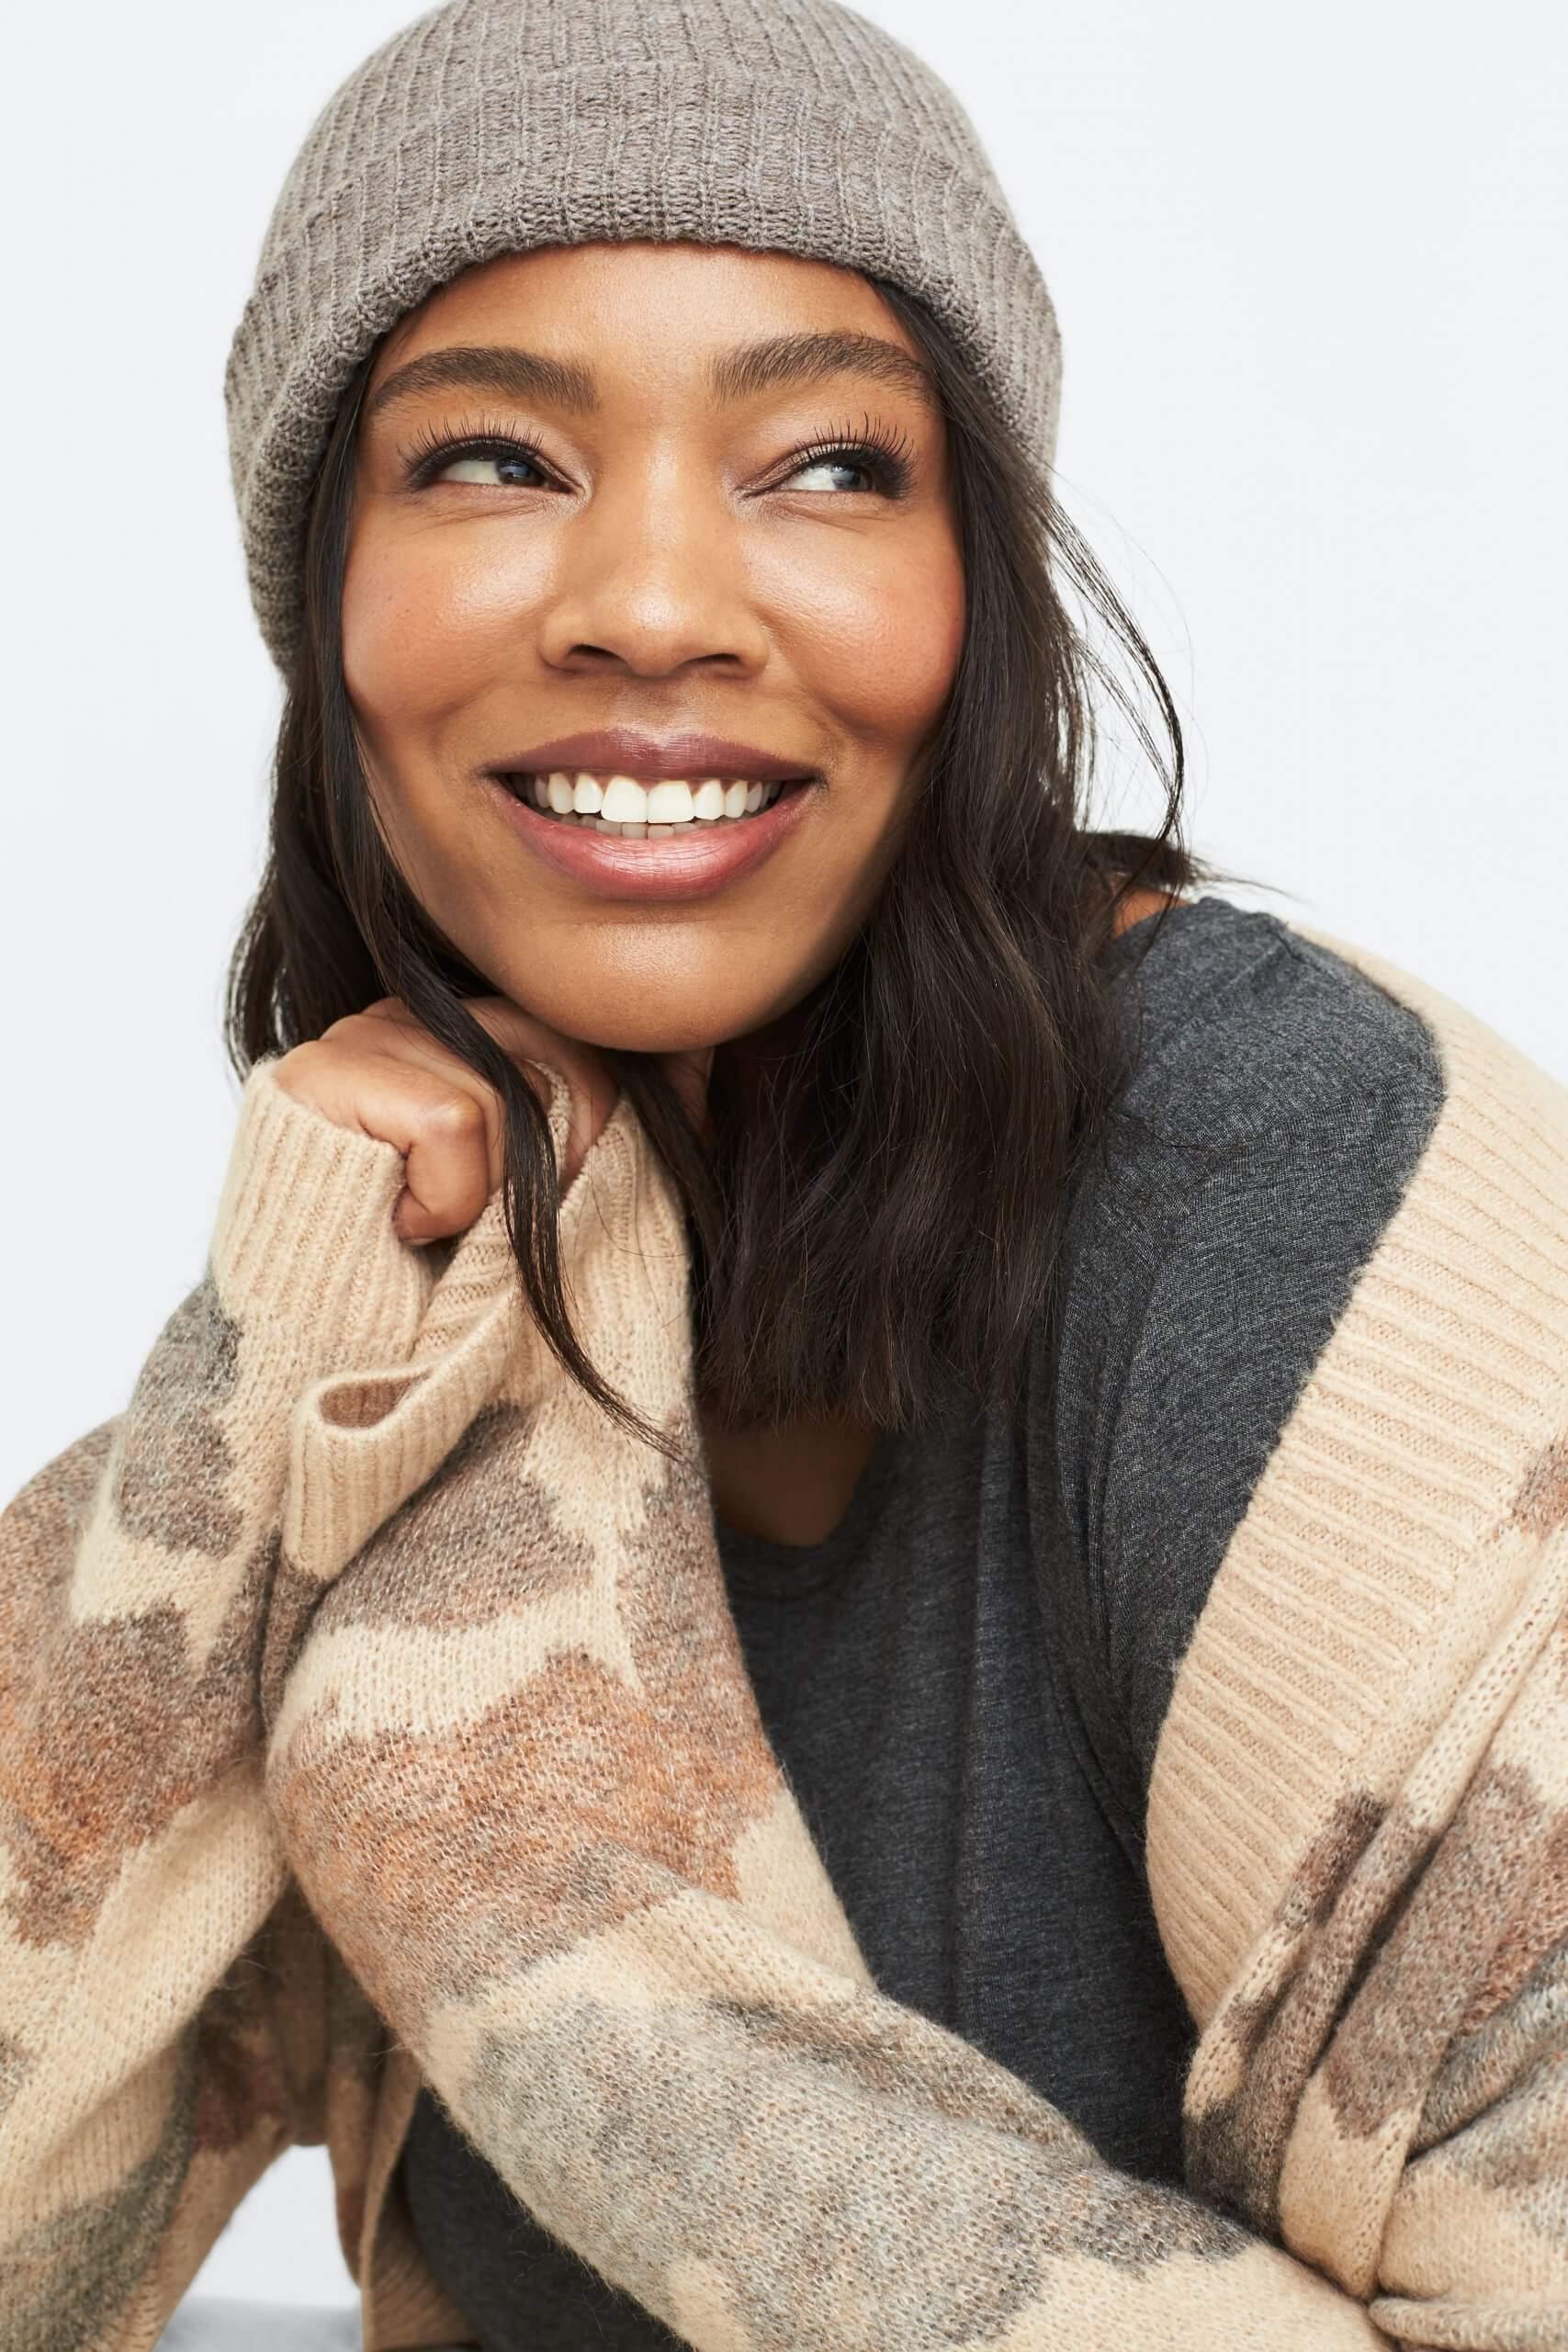 Stitch Fix Women's model wearing a grey beanie, grey knit top and tan printed cardigan.